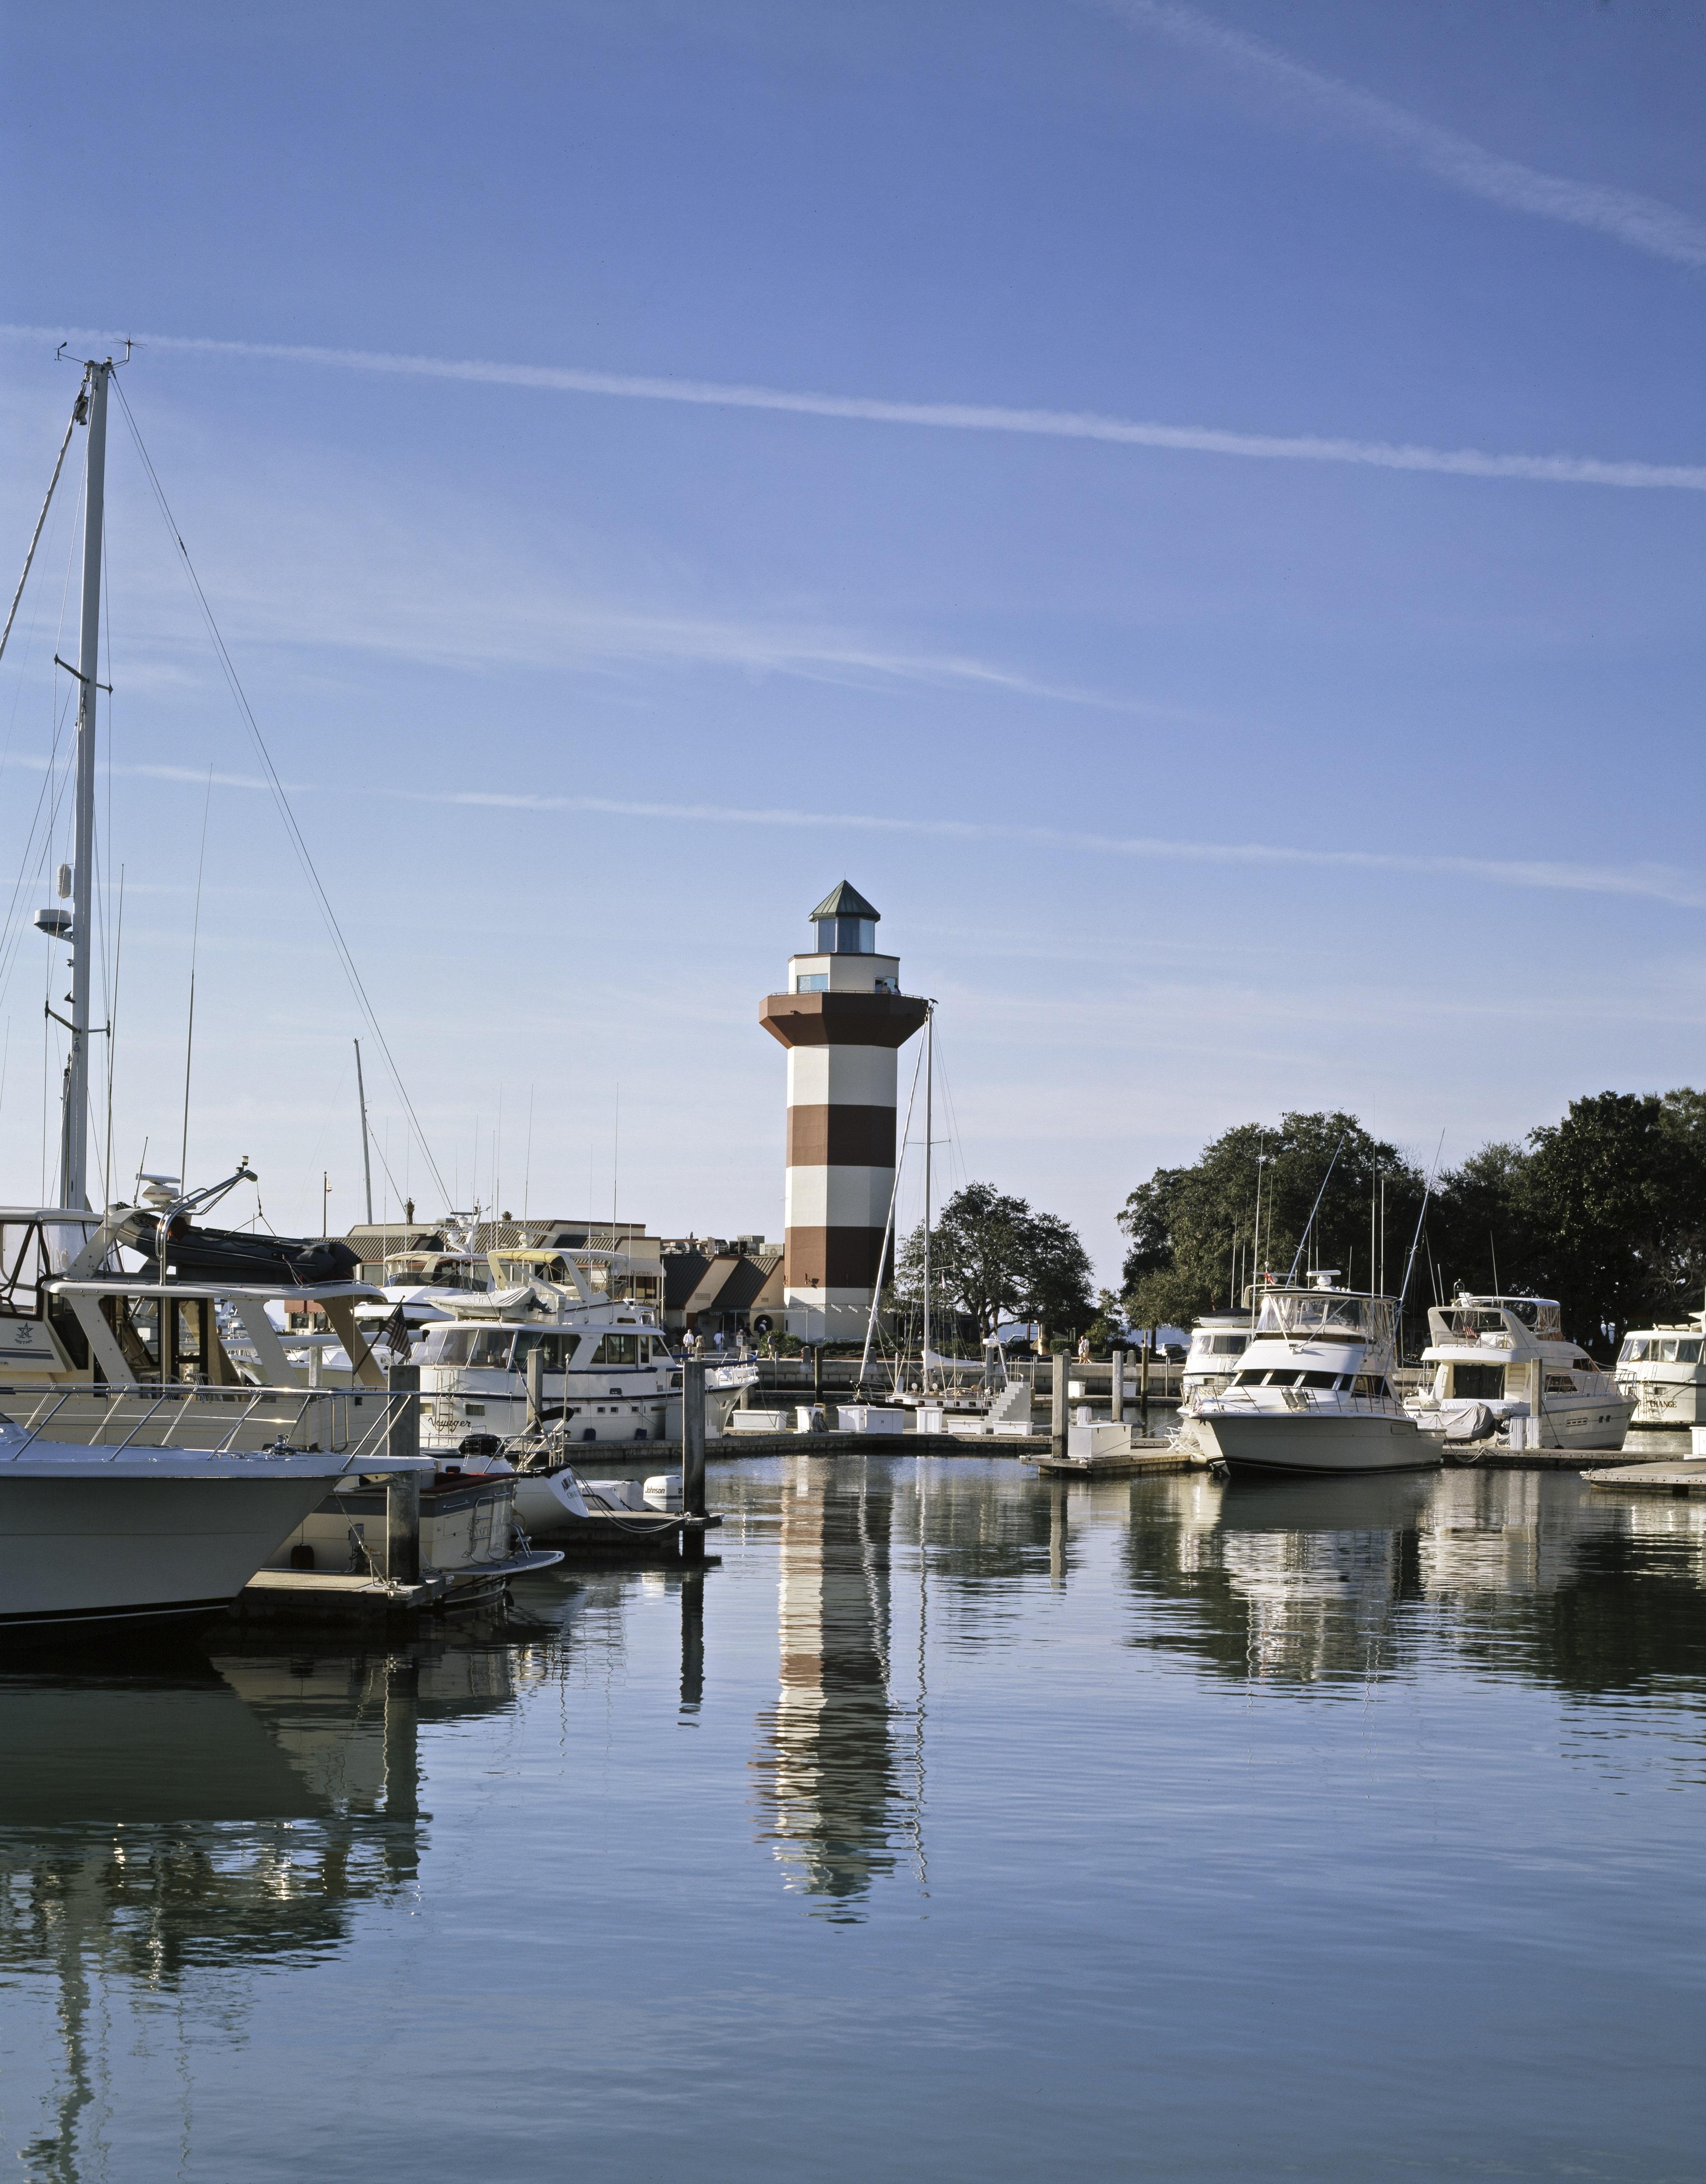 Boatyard photo